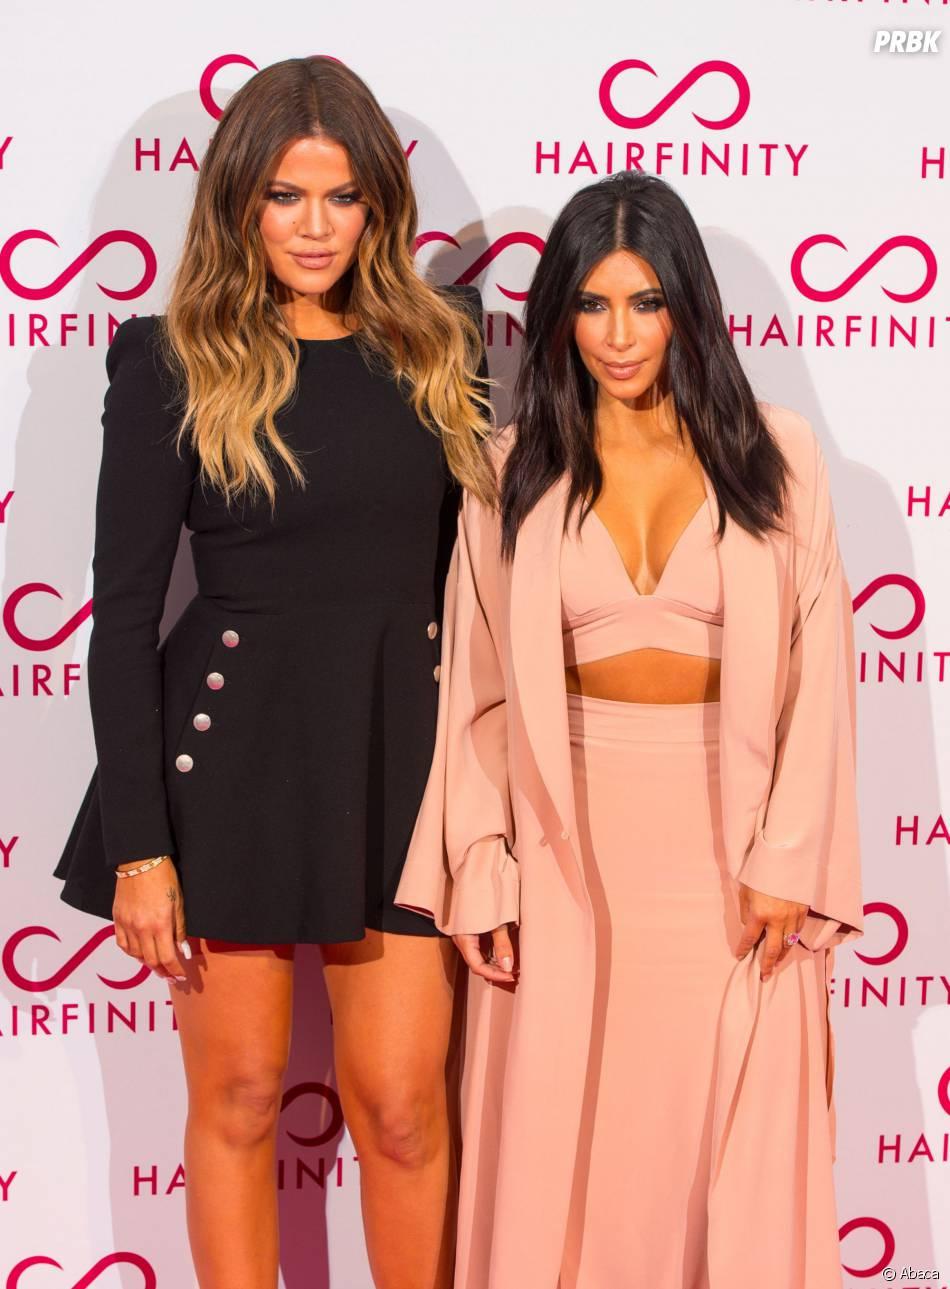 Khloe Kardashian et Kim Kardashian : duo sexy à la soirée Hairfinity, le 8 novembre 2014 à Londres